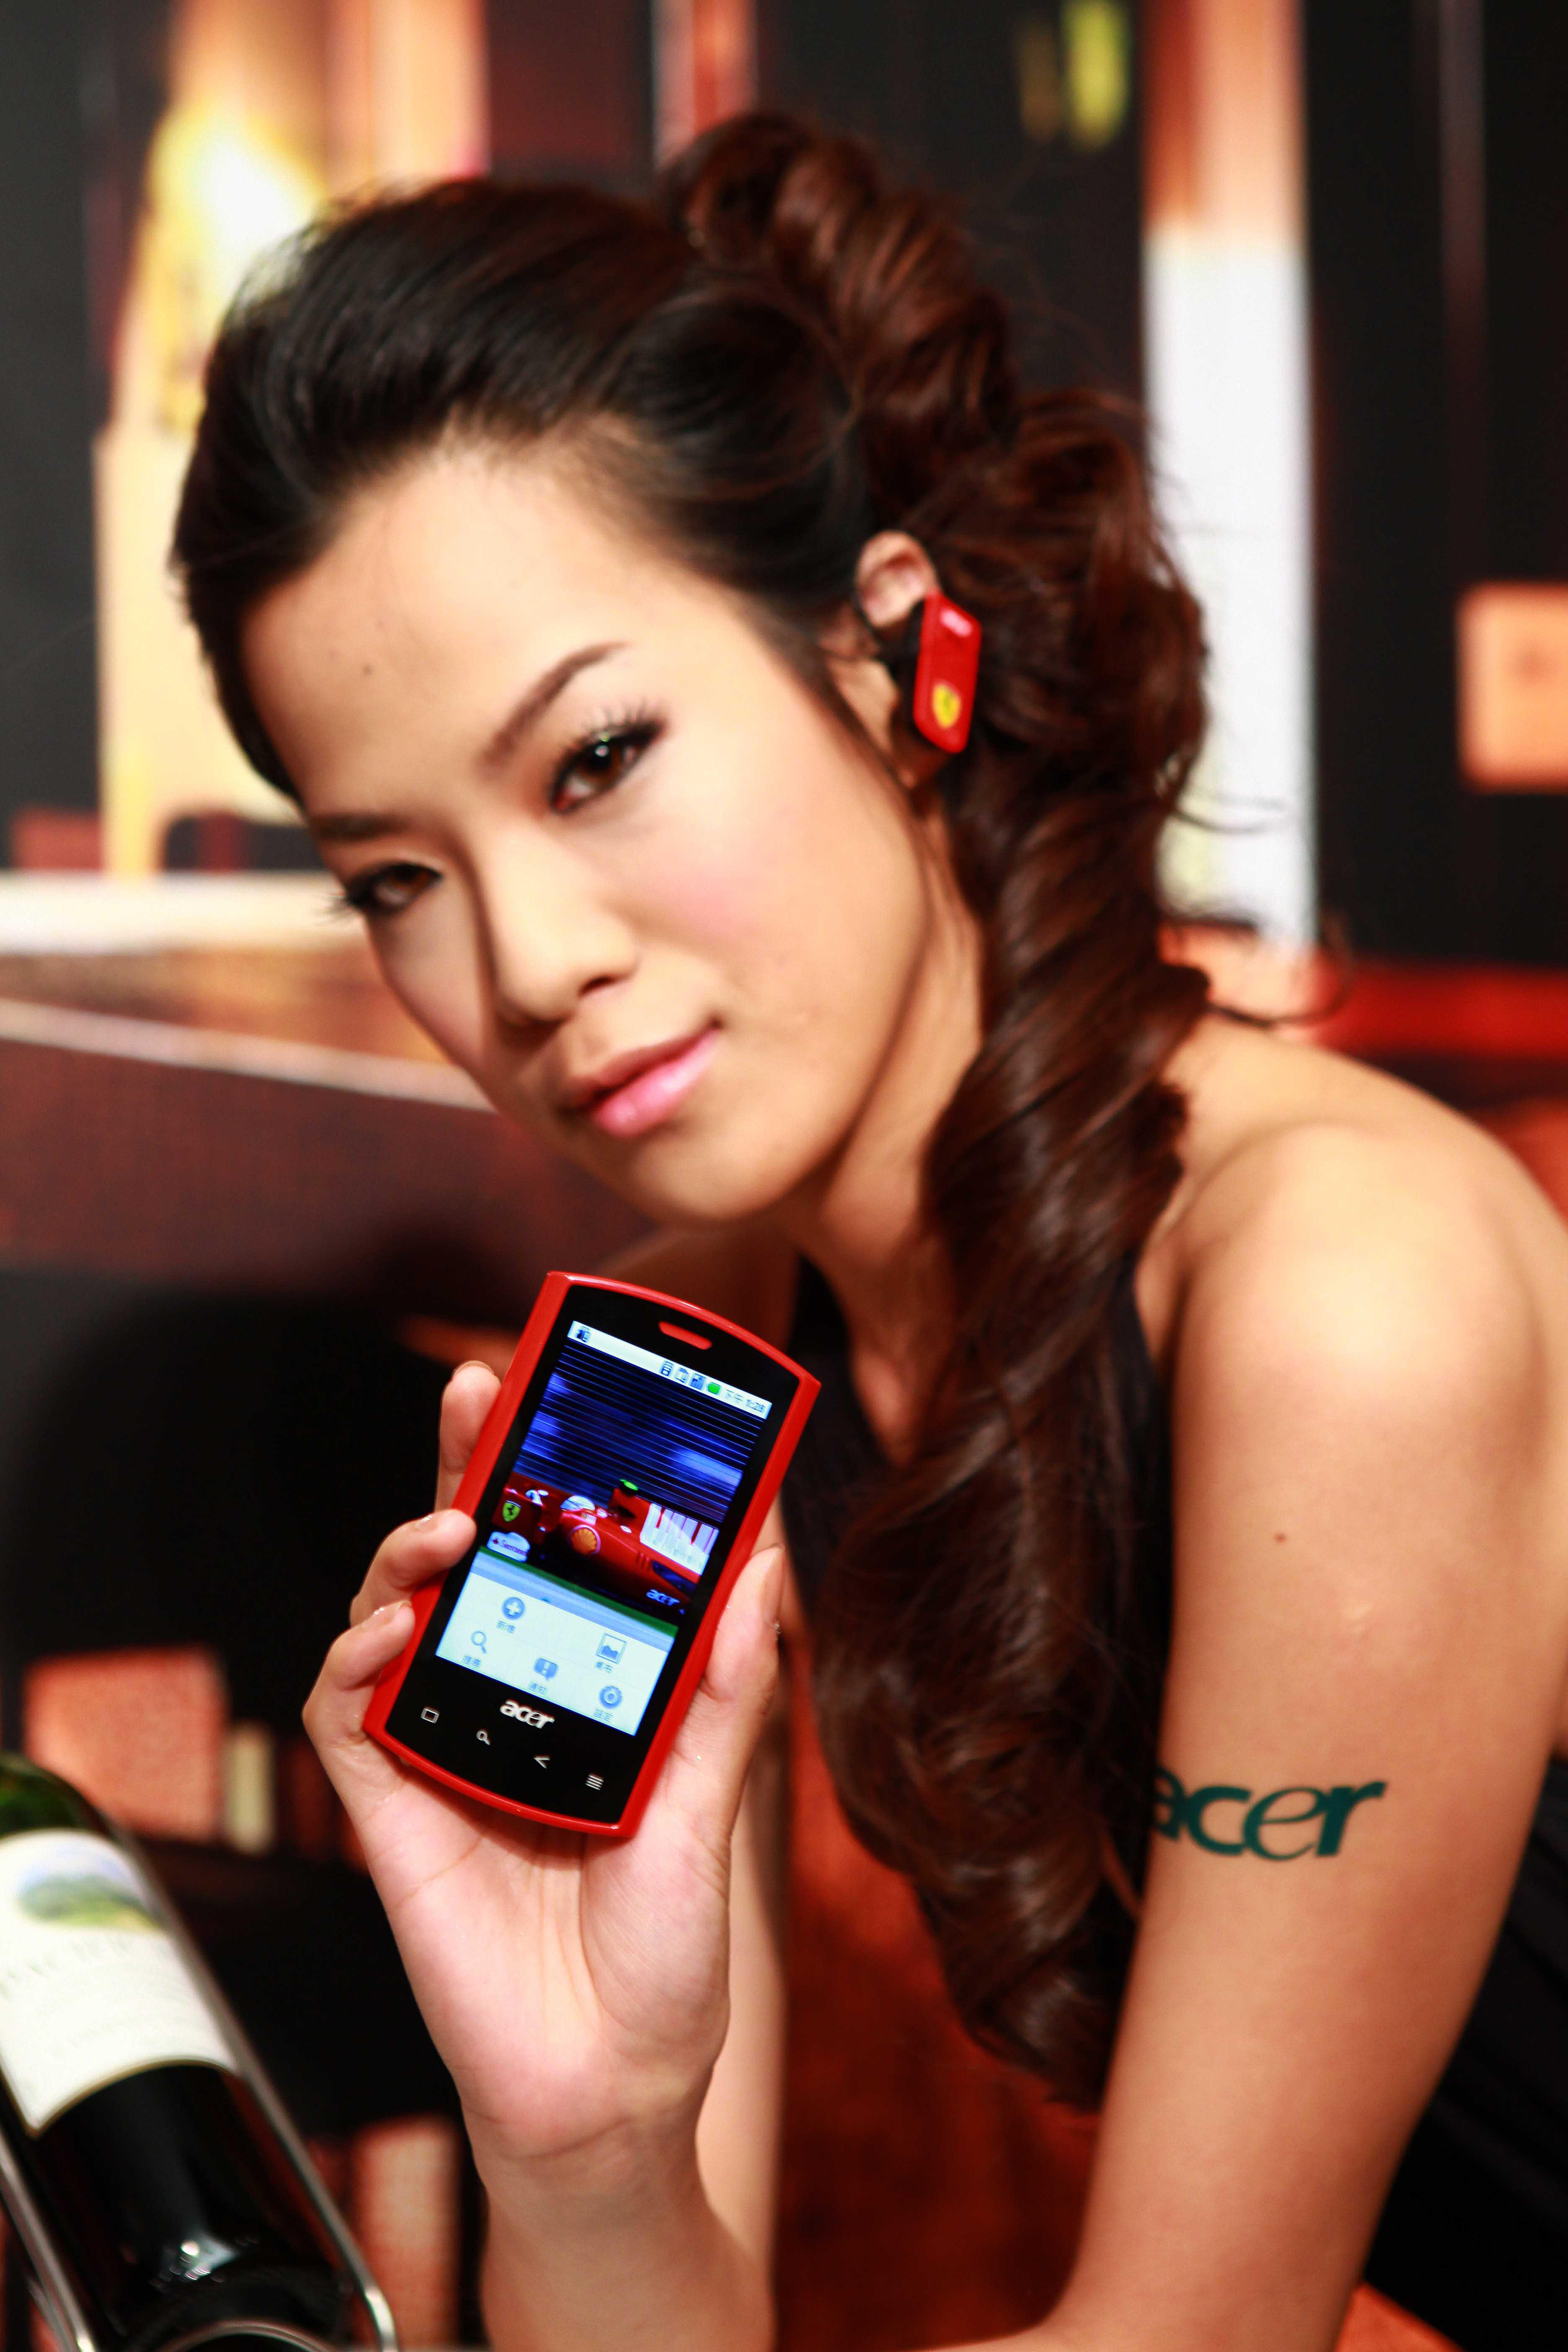 Acer智慧型手機Liquid全面升級為Android 2.1版